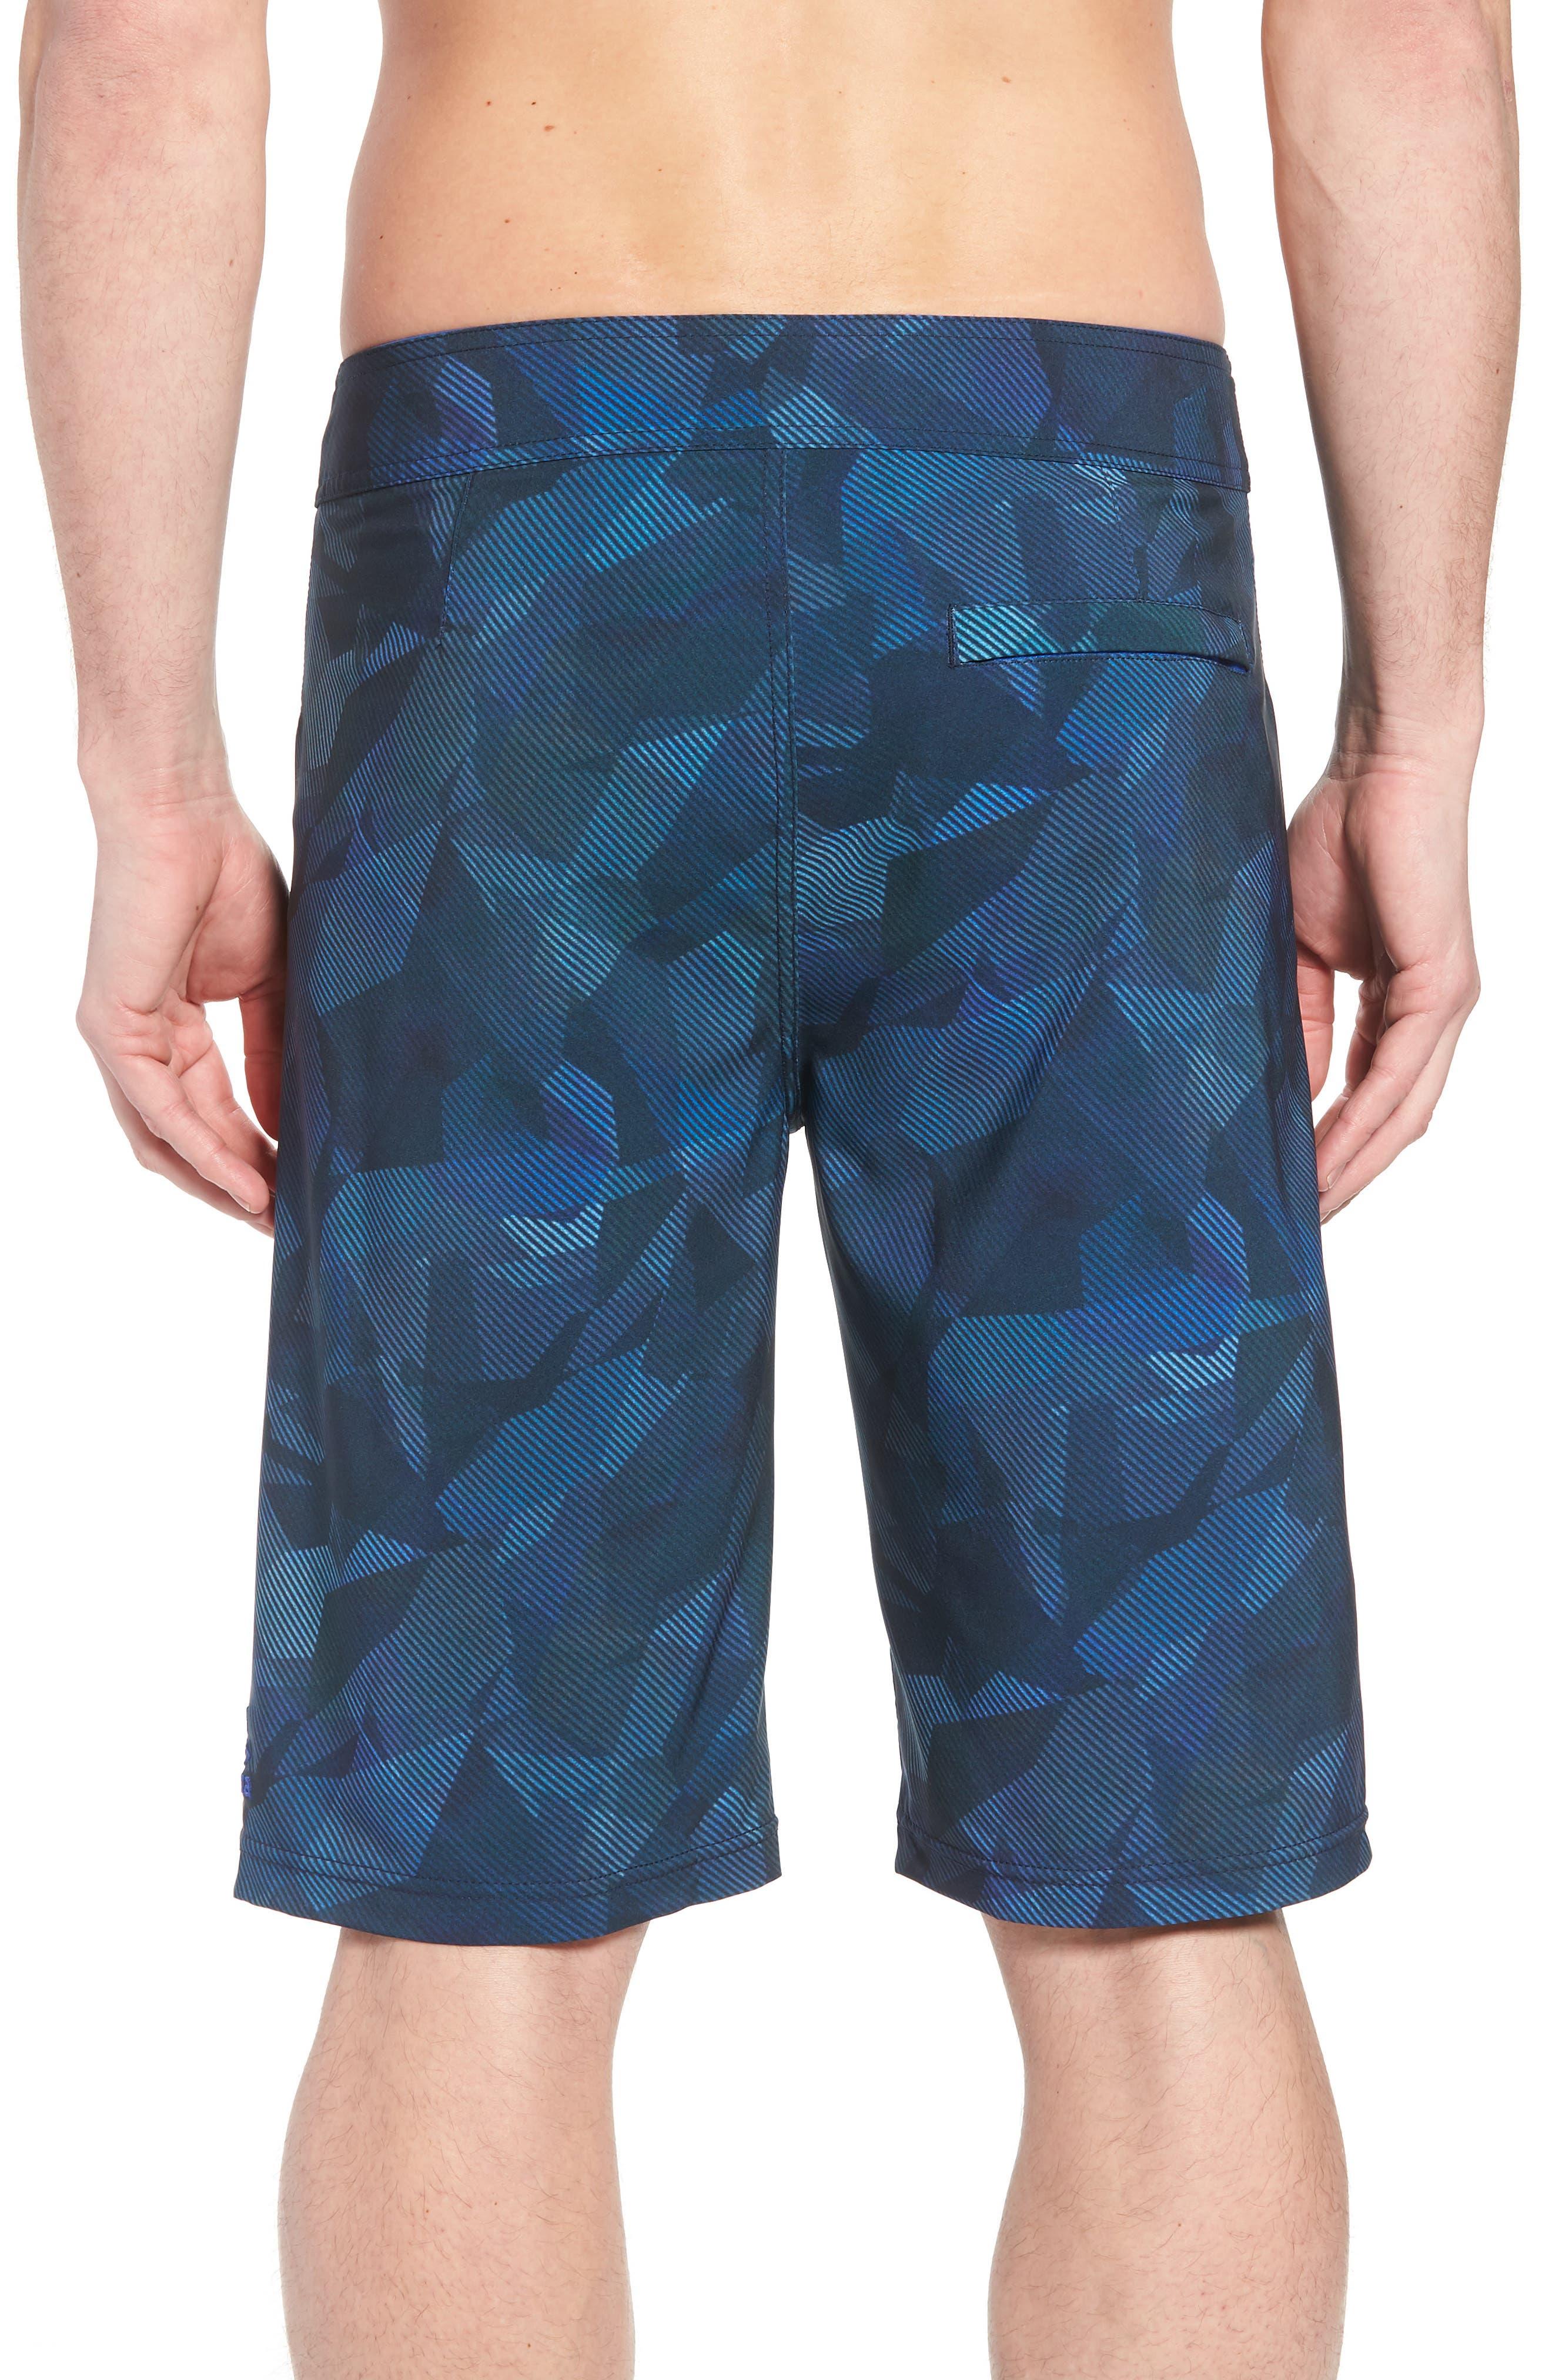 'Sediment' Stretch Board Shorts,                             Alternate thumbnail 2, color,                             Island Blue Hex